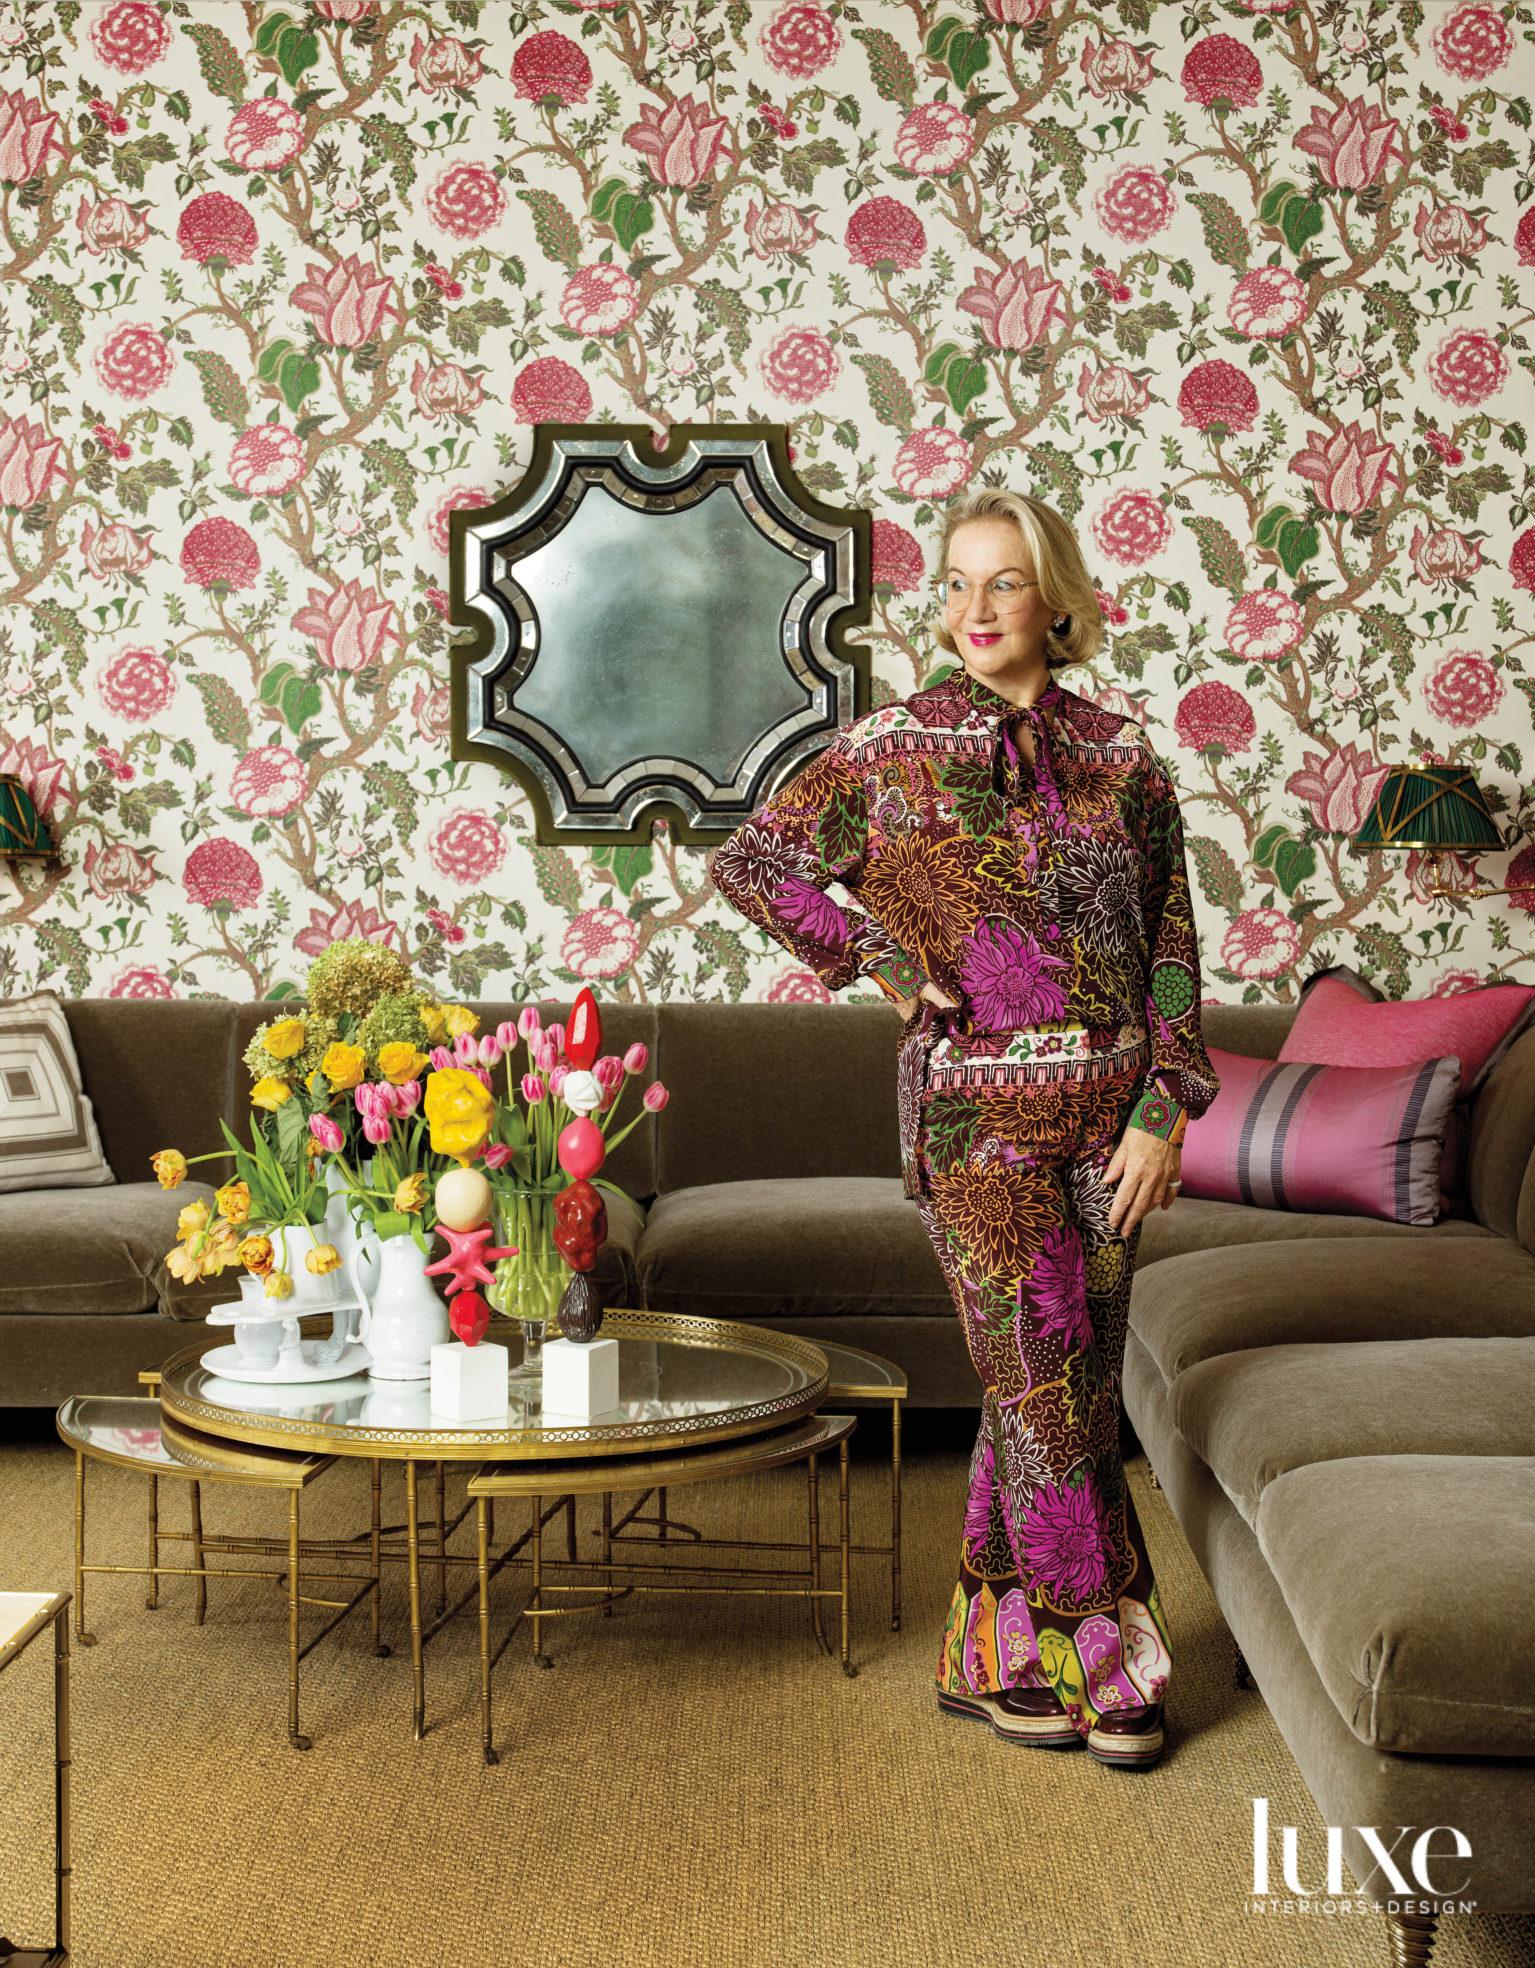 alessandra branca portrait floral wallpaper